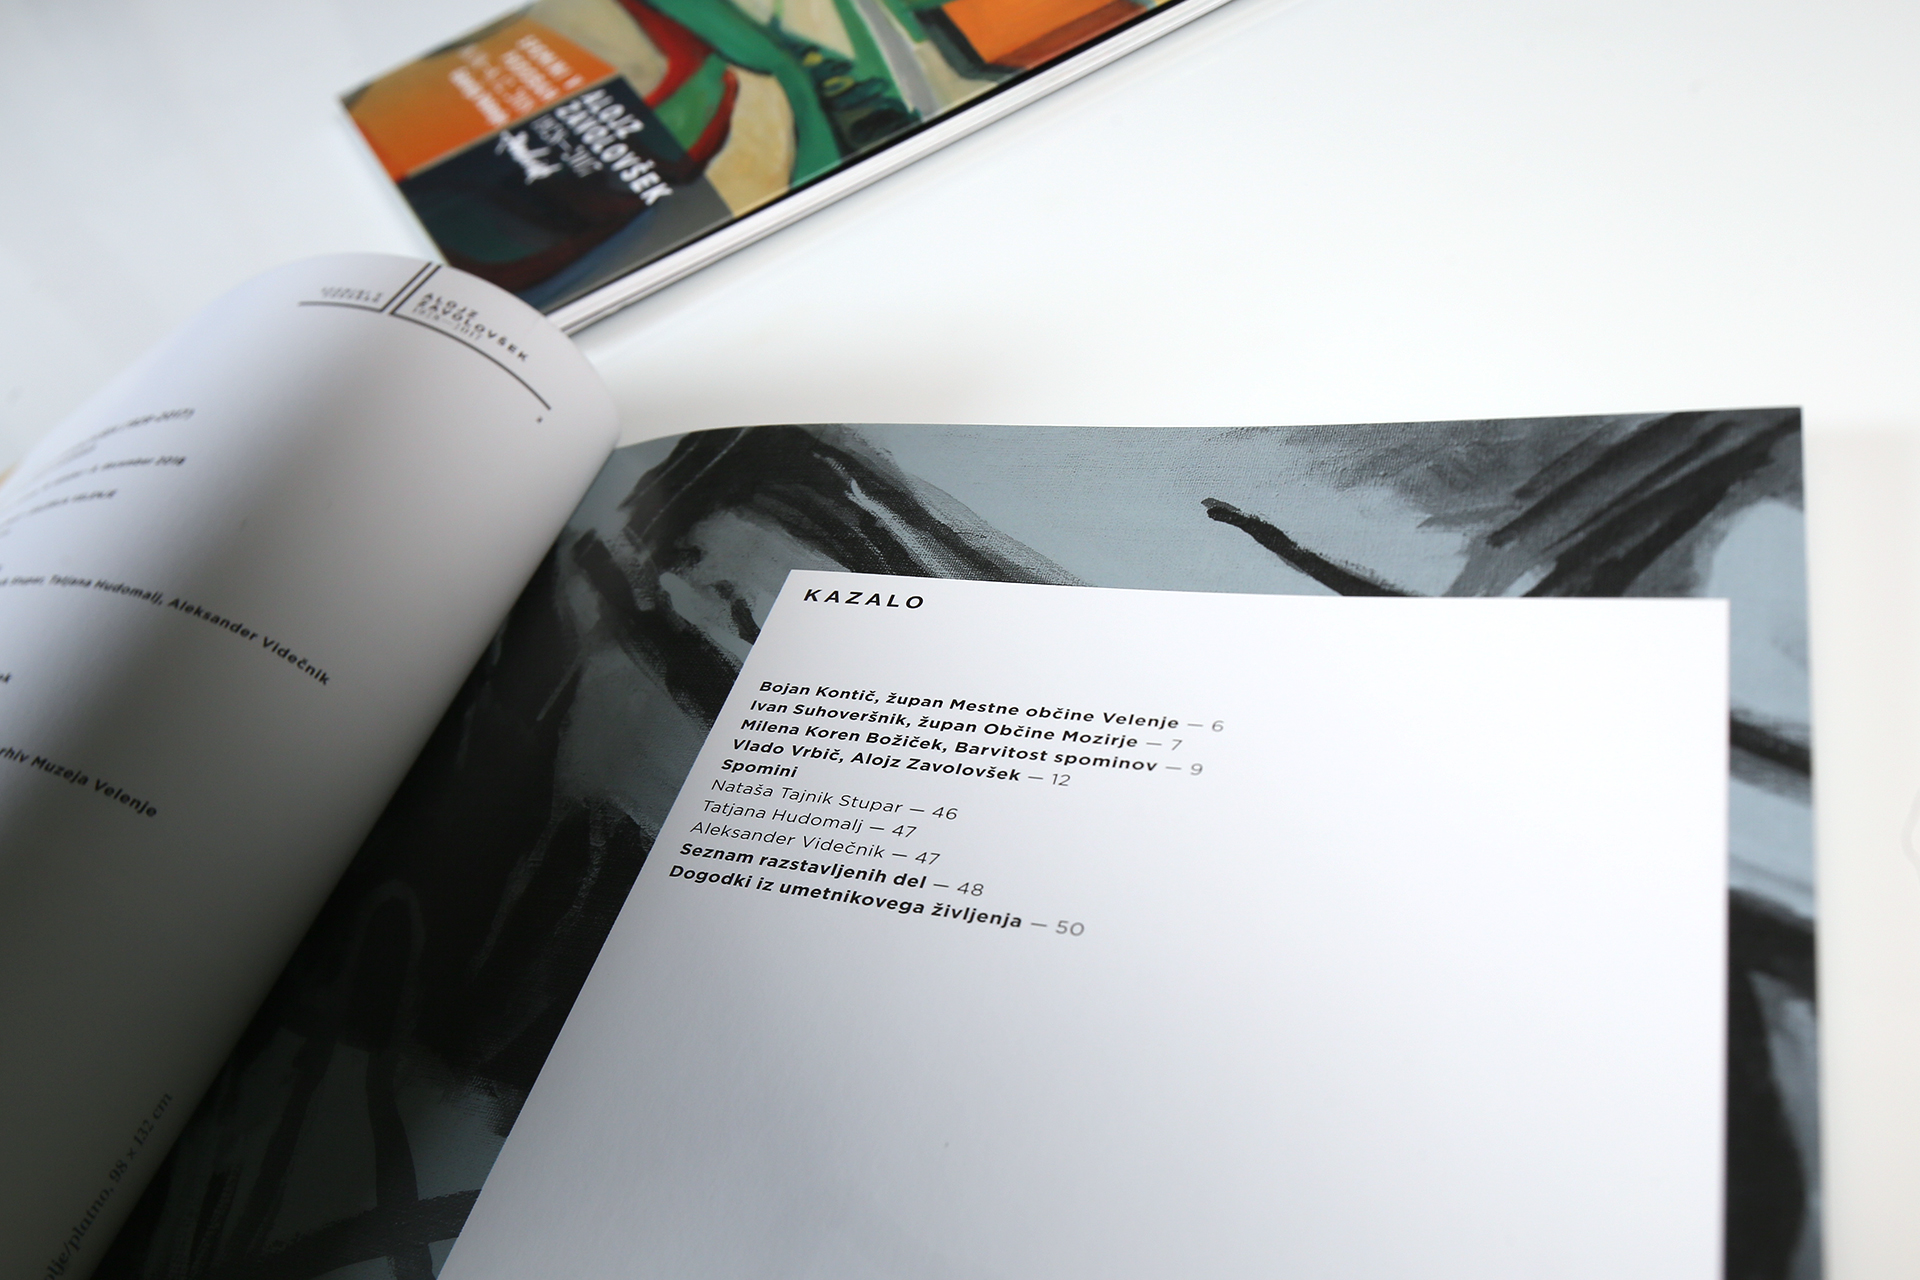 razstava_zavolovsek_galerija_velenje_marko_marinsek_studio_ma-ma_